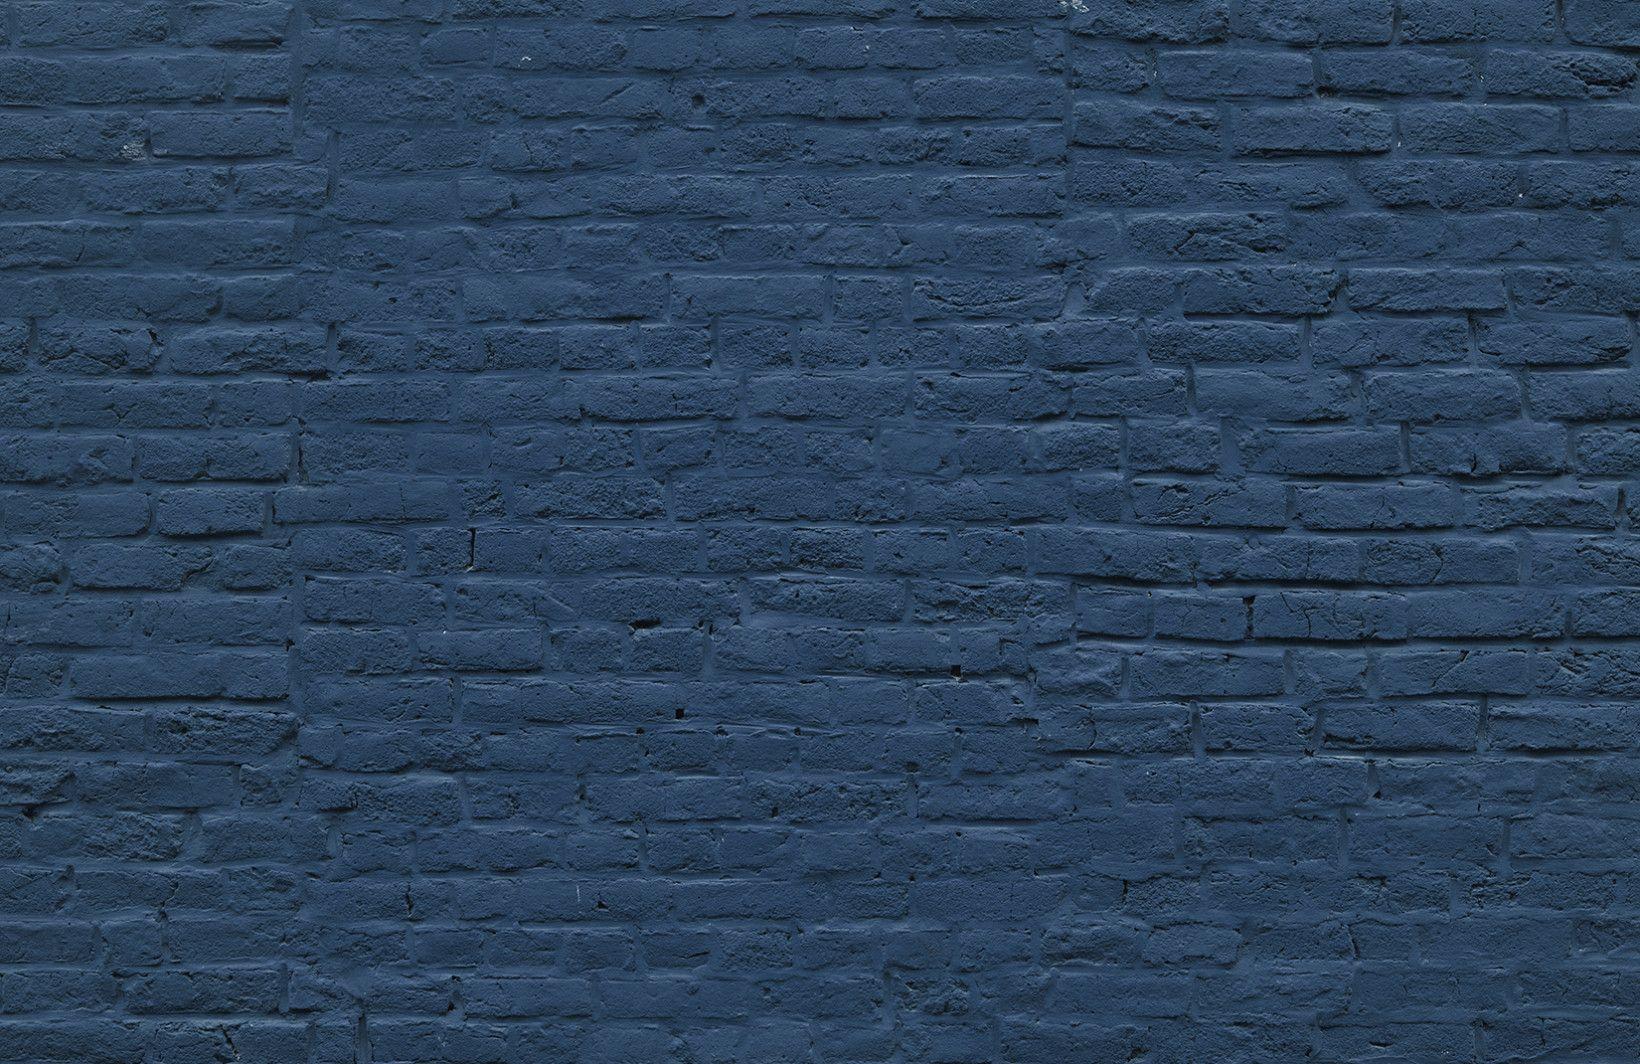 Navy Blue Brick Wallpaper Dark Brick Effect